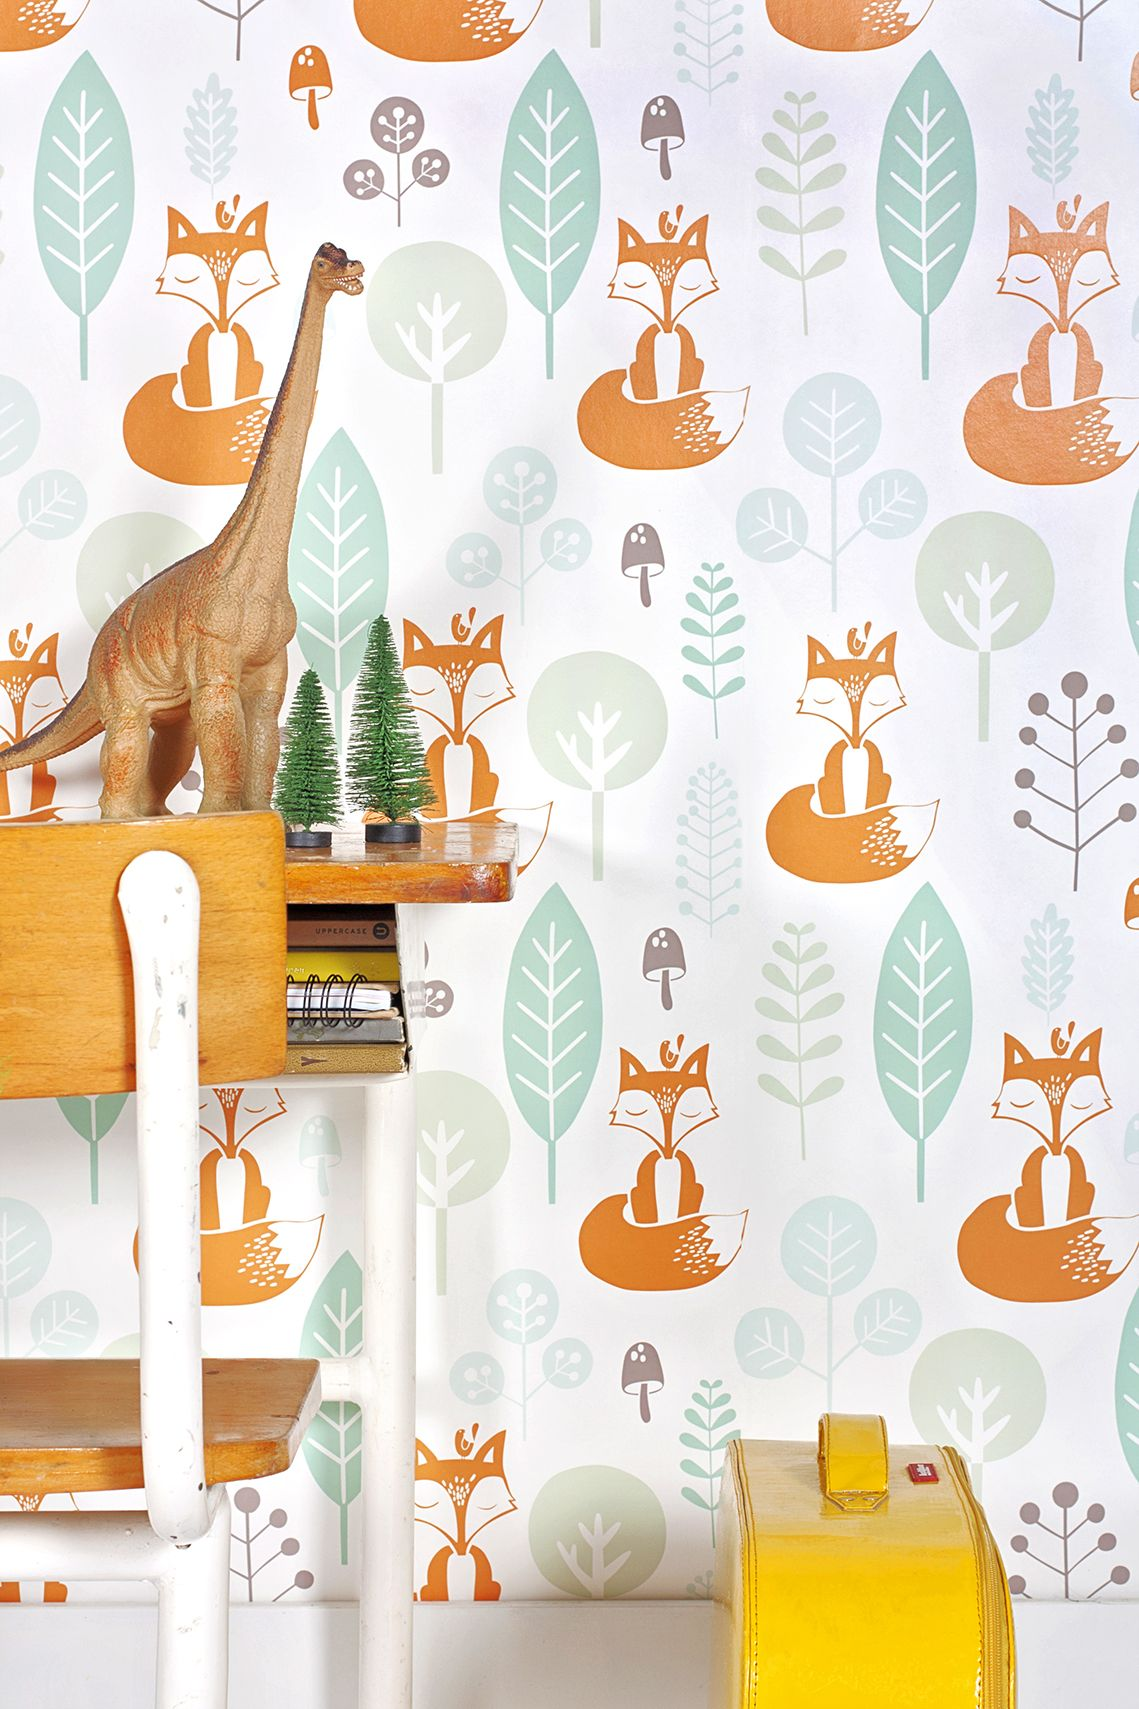 Retro look vosjes behang #wallpaper   Roodborstje via Kinderkamerstylist.nl